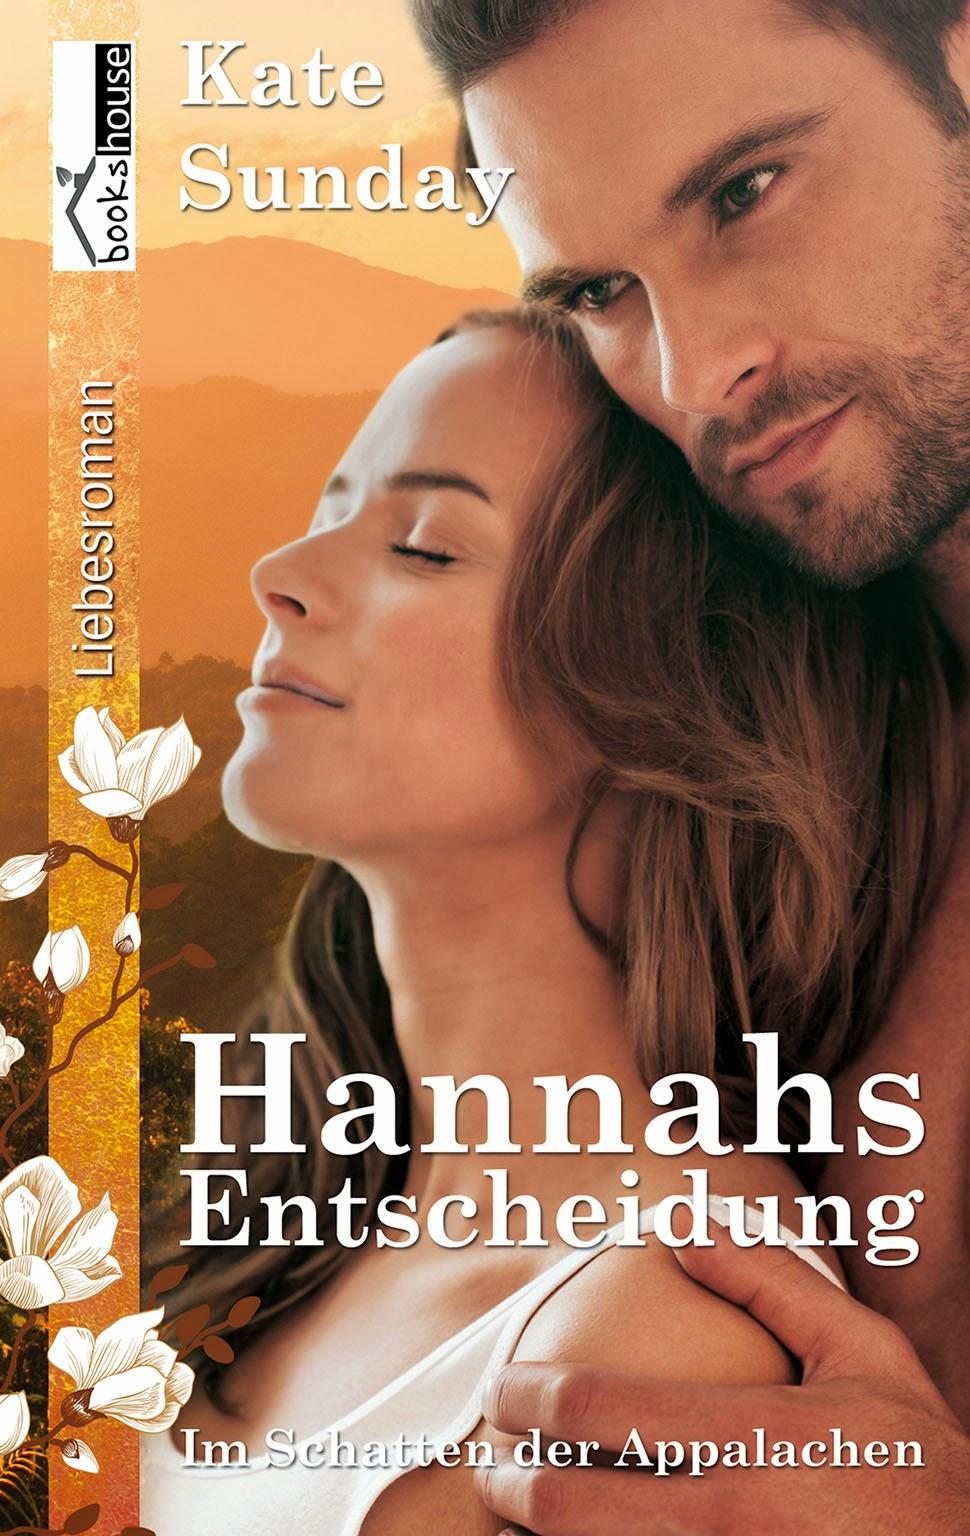 http://www.amazon.de/Hannahs-Entscheidung-Im-Schatten-Appalachen-ebook/dp/B00I5ZGZ4W/ref=cm_cr_pr_pb_t